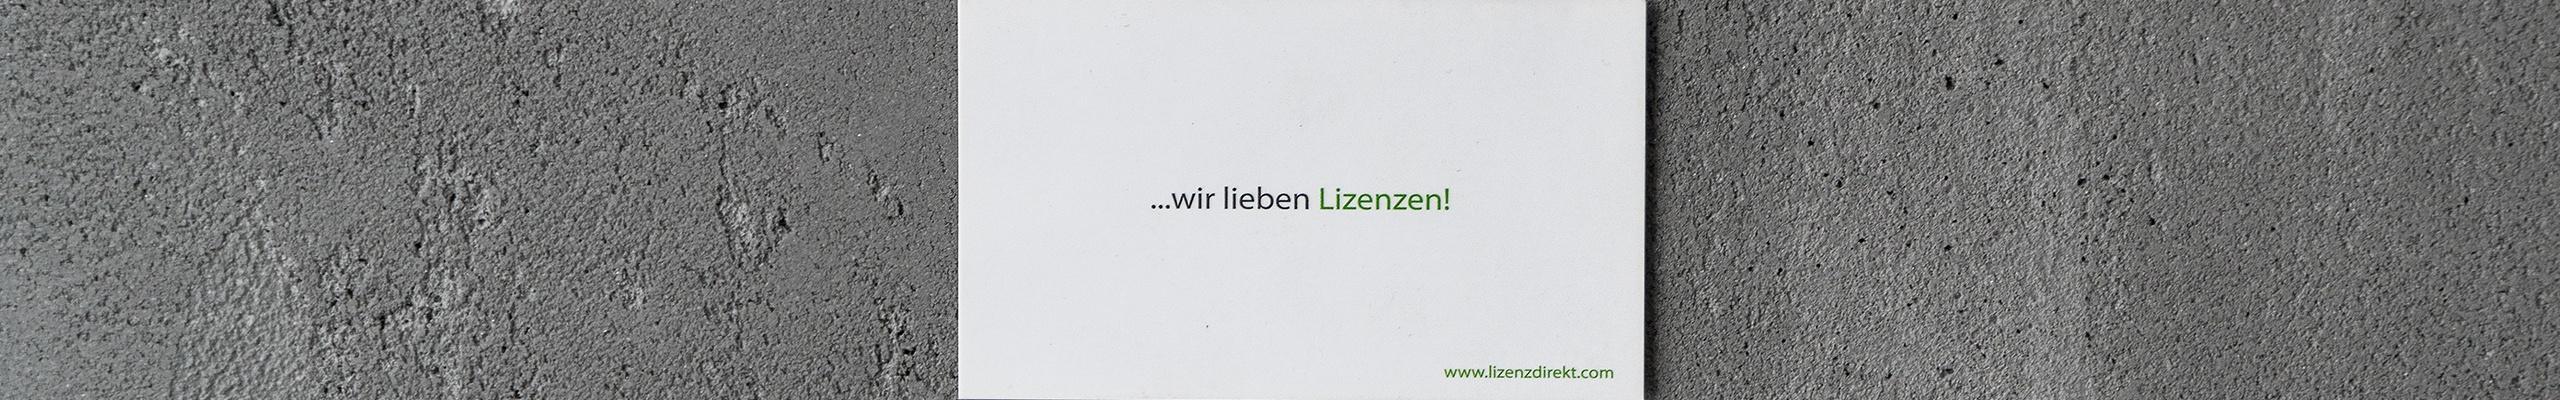 Corporate Fotografie in Bremen - Linus Klose Photography